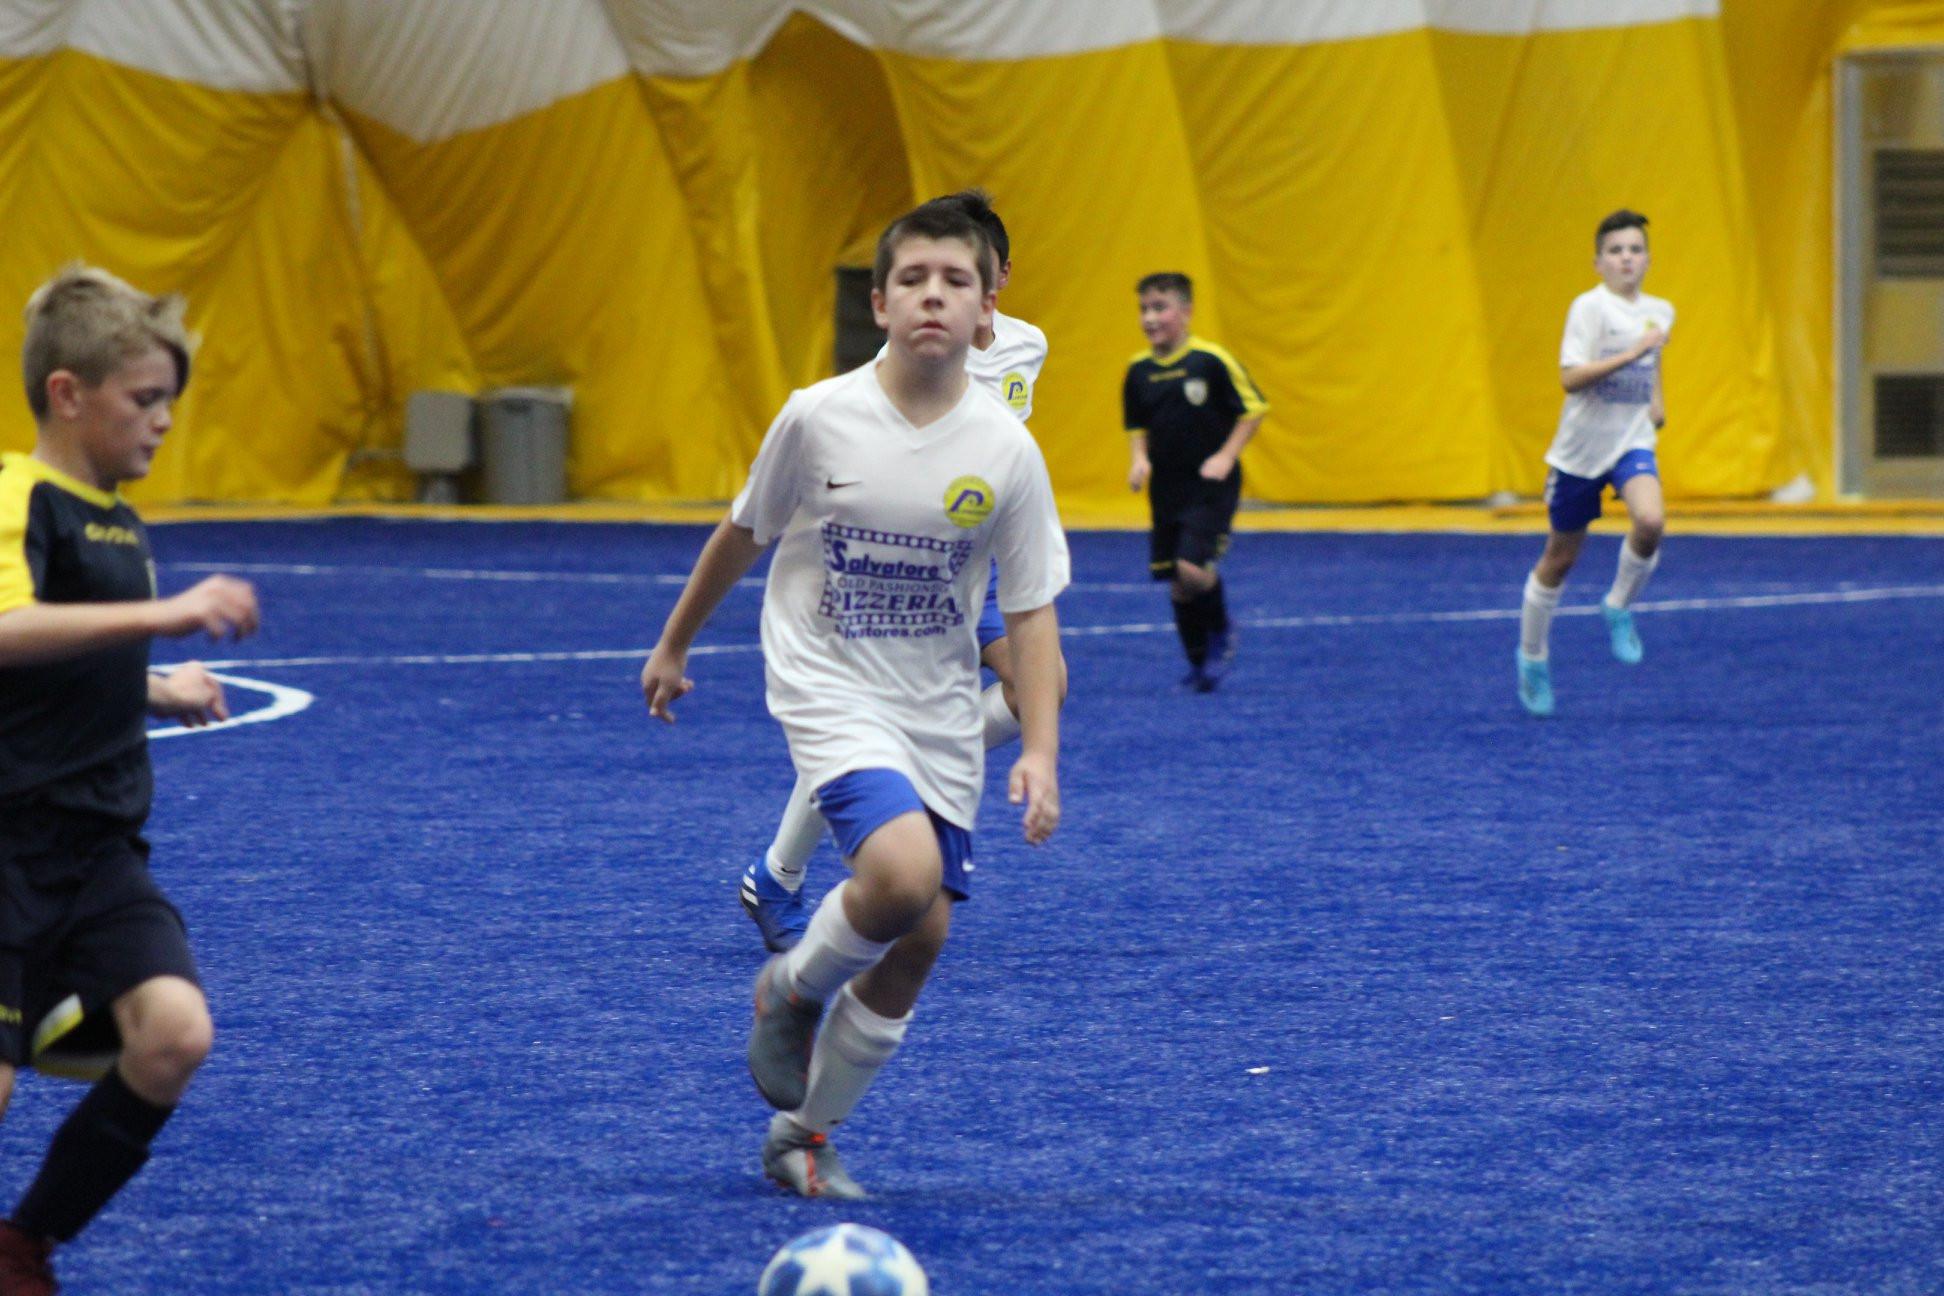 Saturday's 9v9 Indoor League